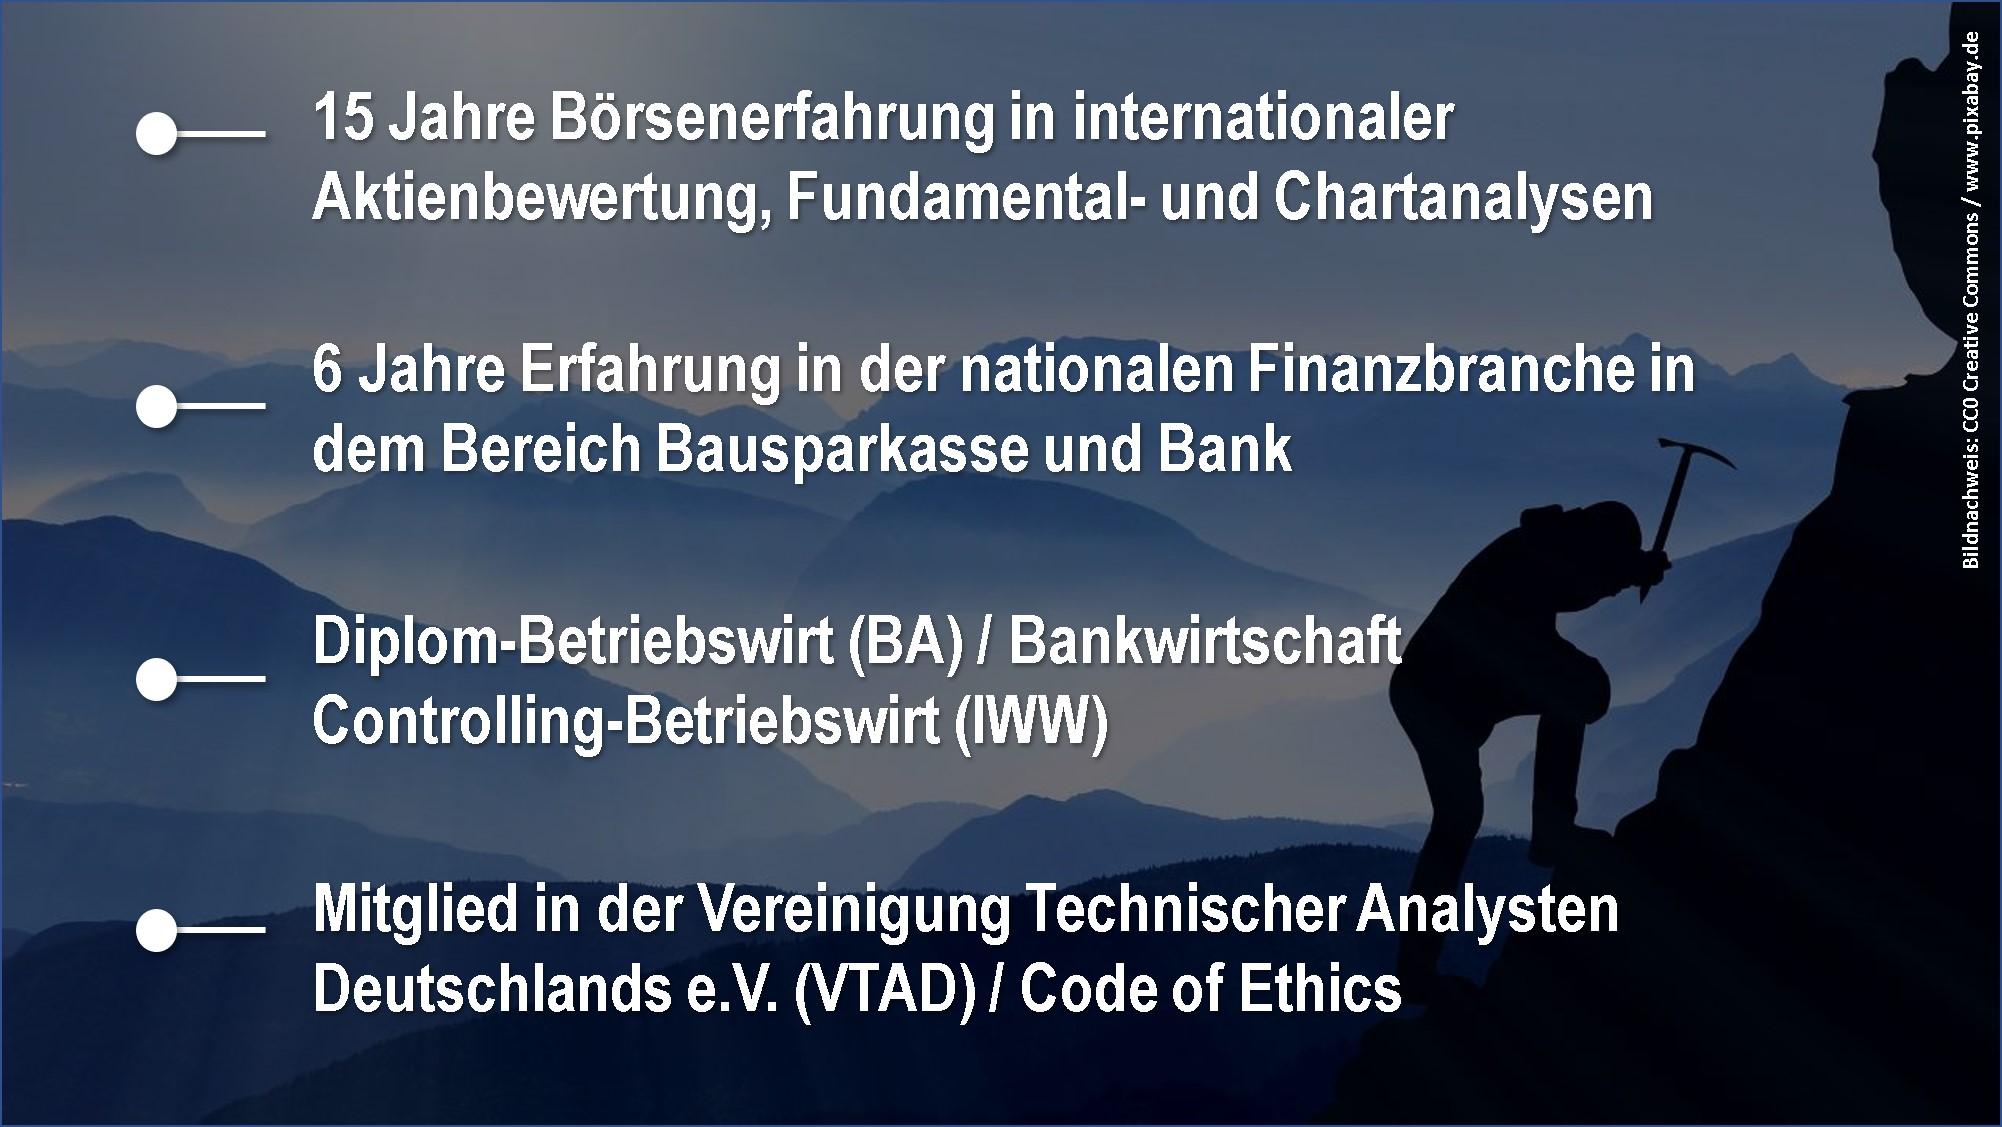 trendKANAL Jürgen Bethke Expertenprofil